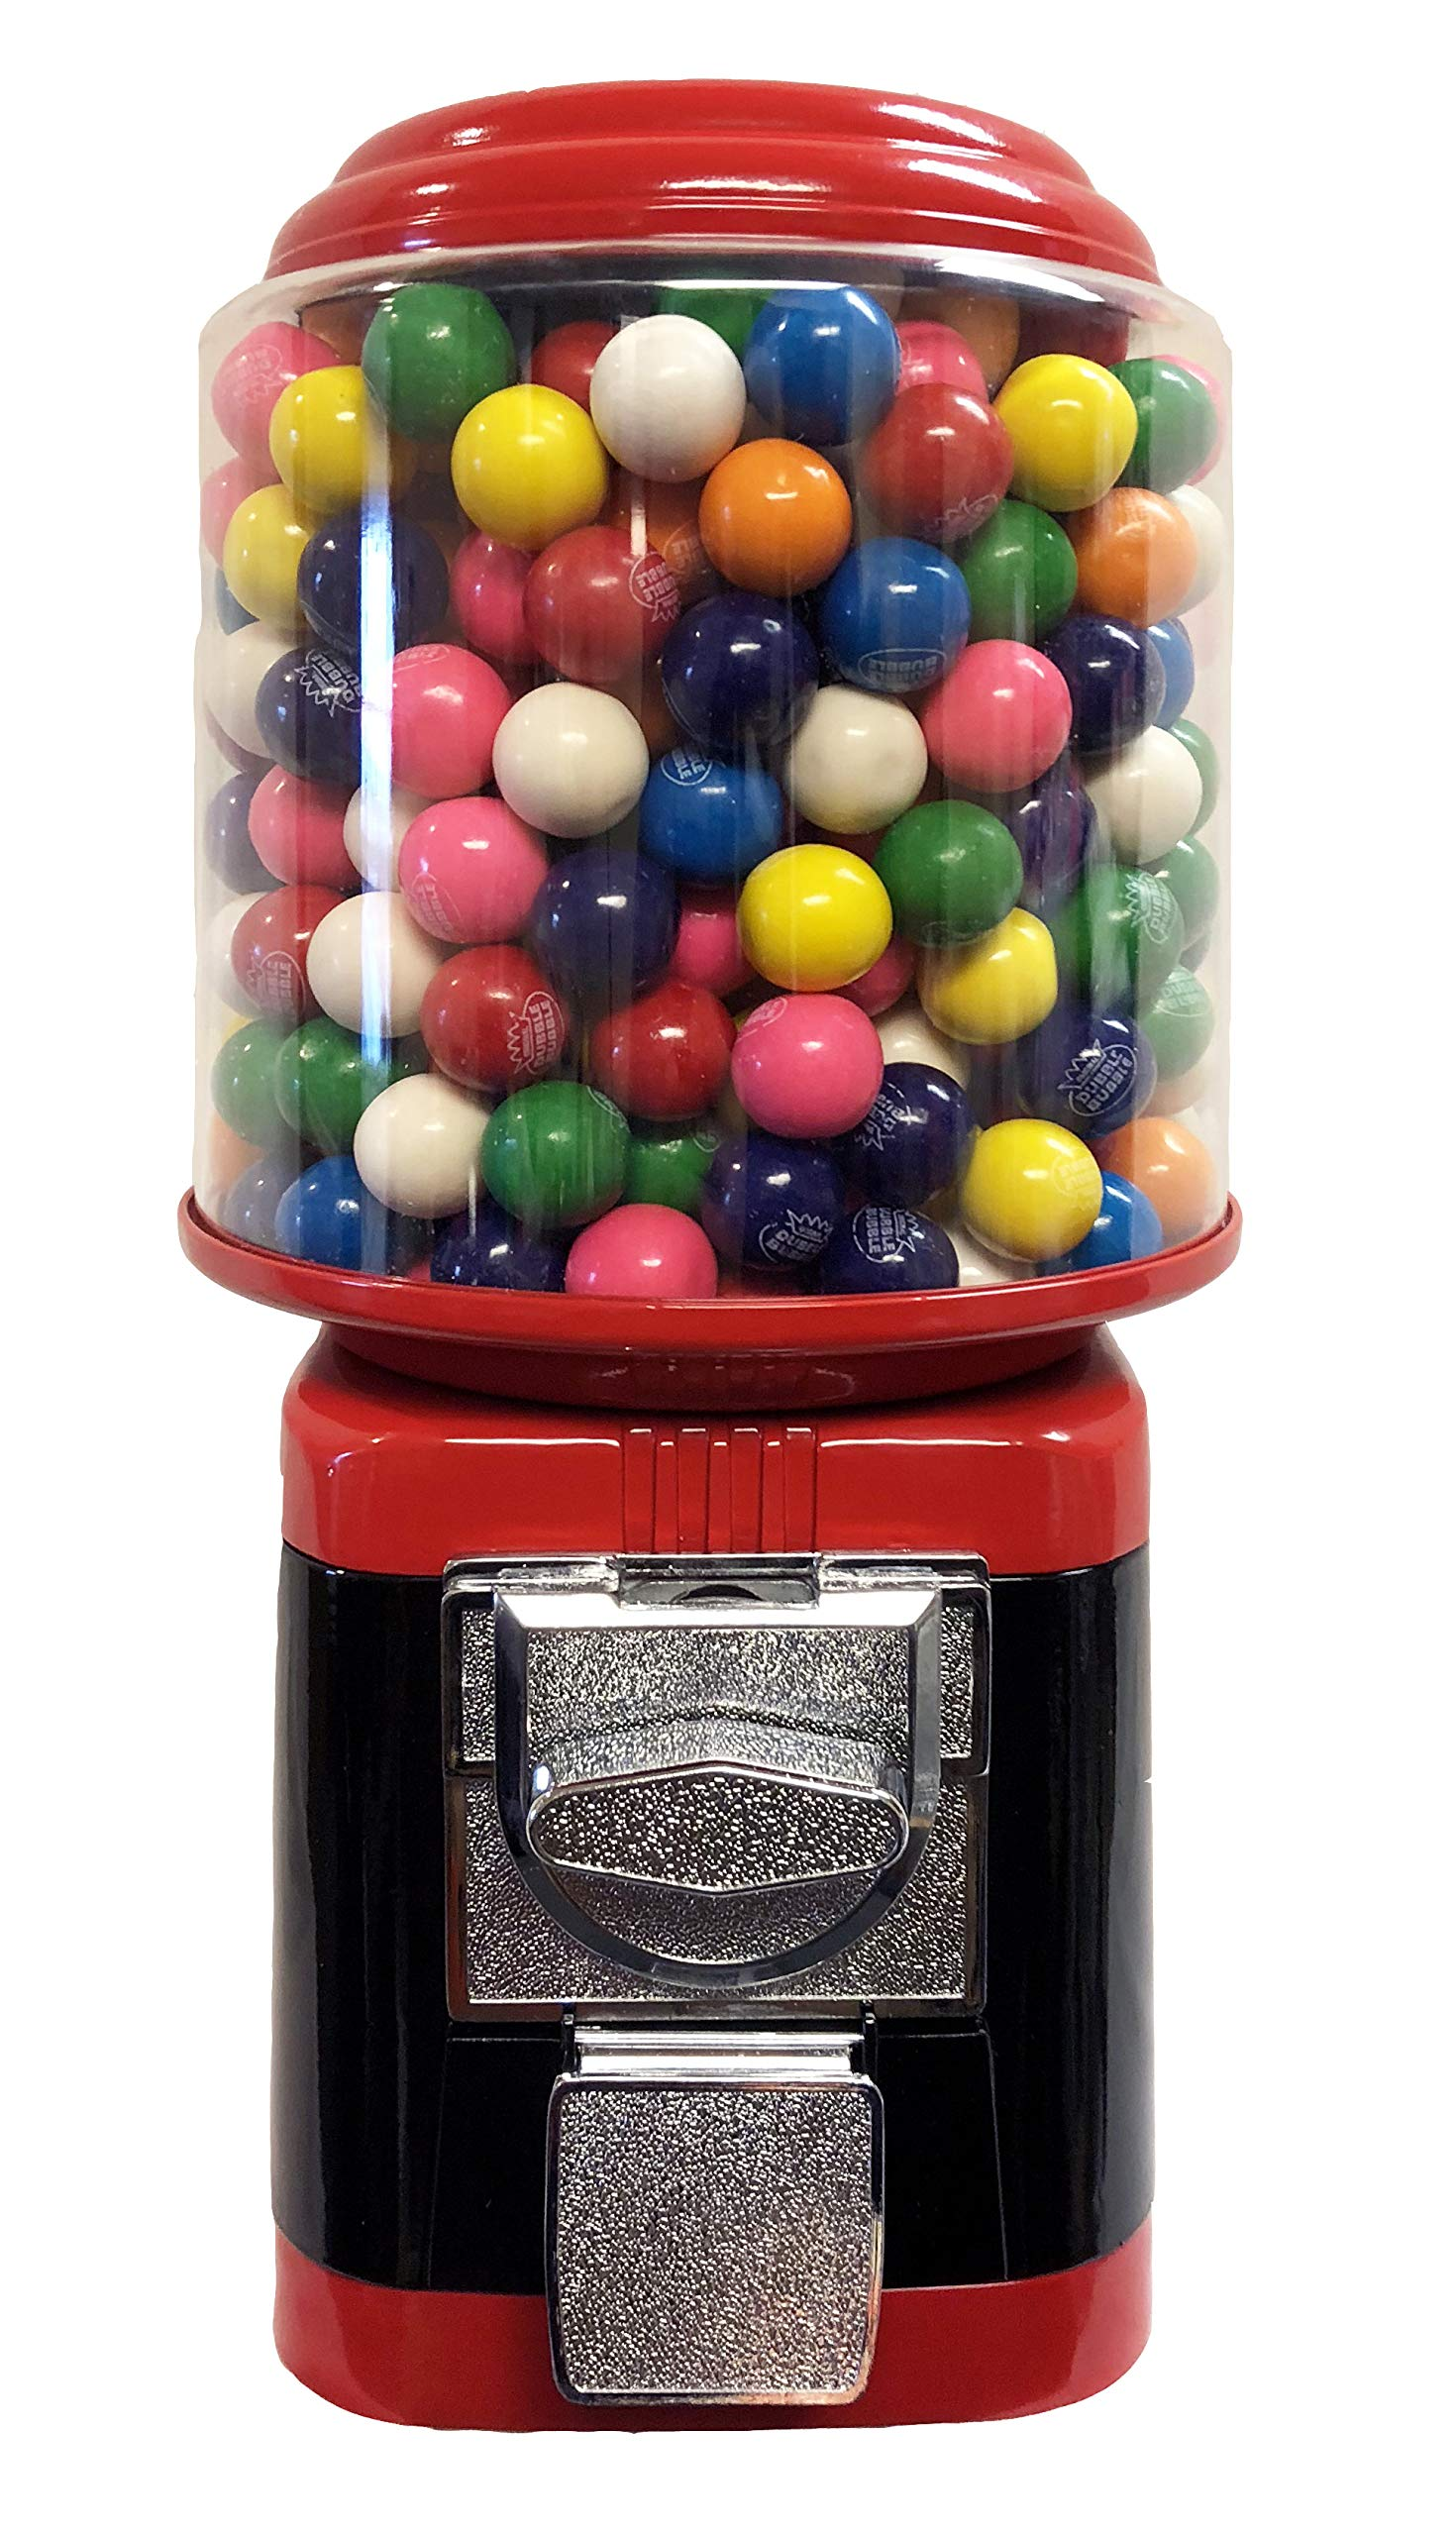 Wholesale Vending Products All Metal Bulk Vending Gumball Machine (Red/Black)